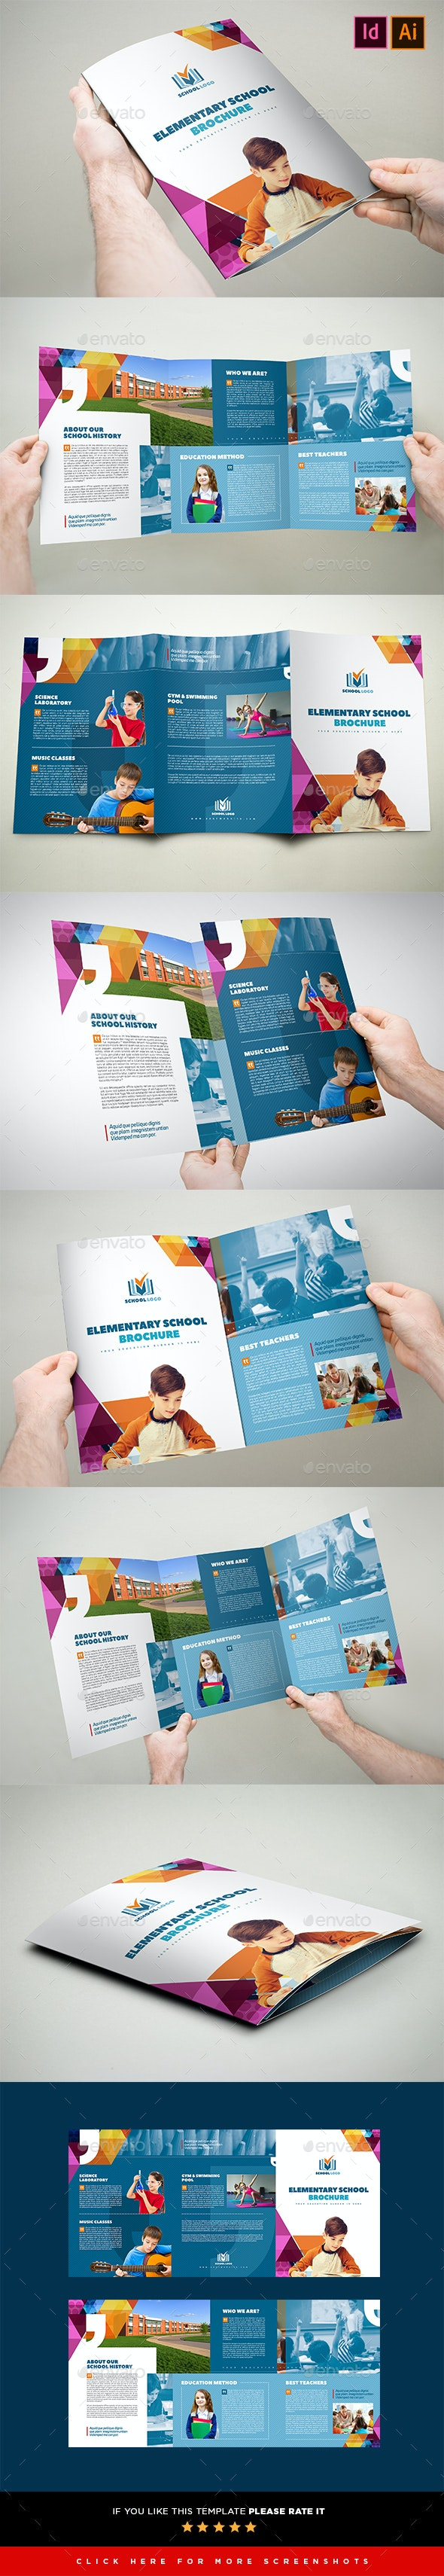 Elementary School Brochure Template 3xA4 Trifold - Corporate Brochures